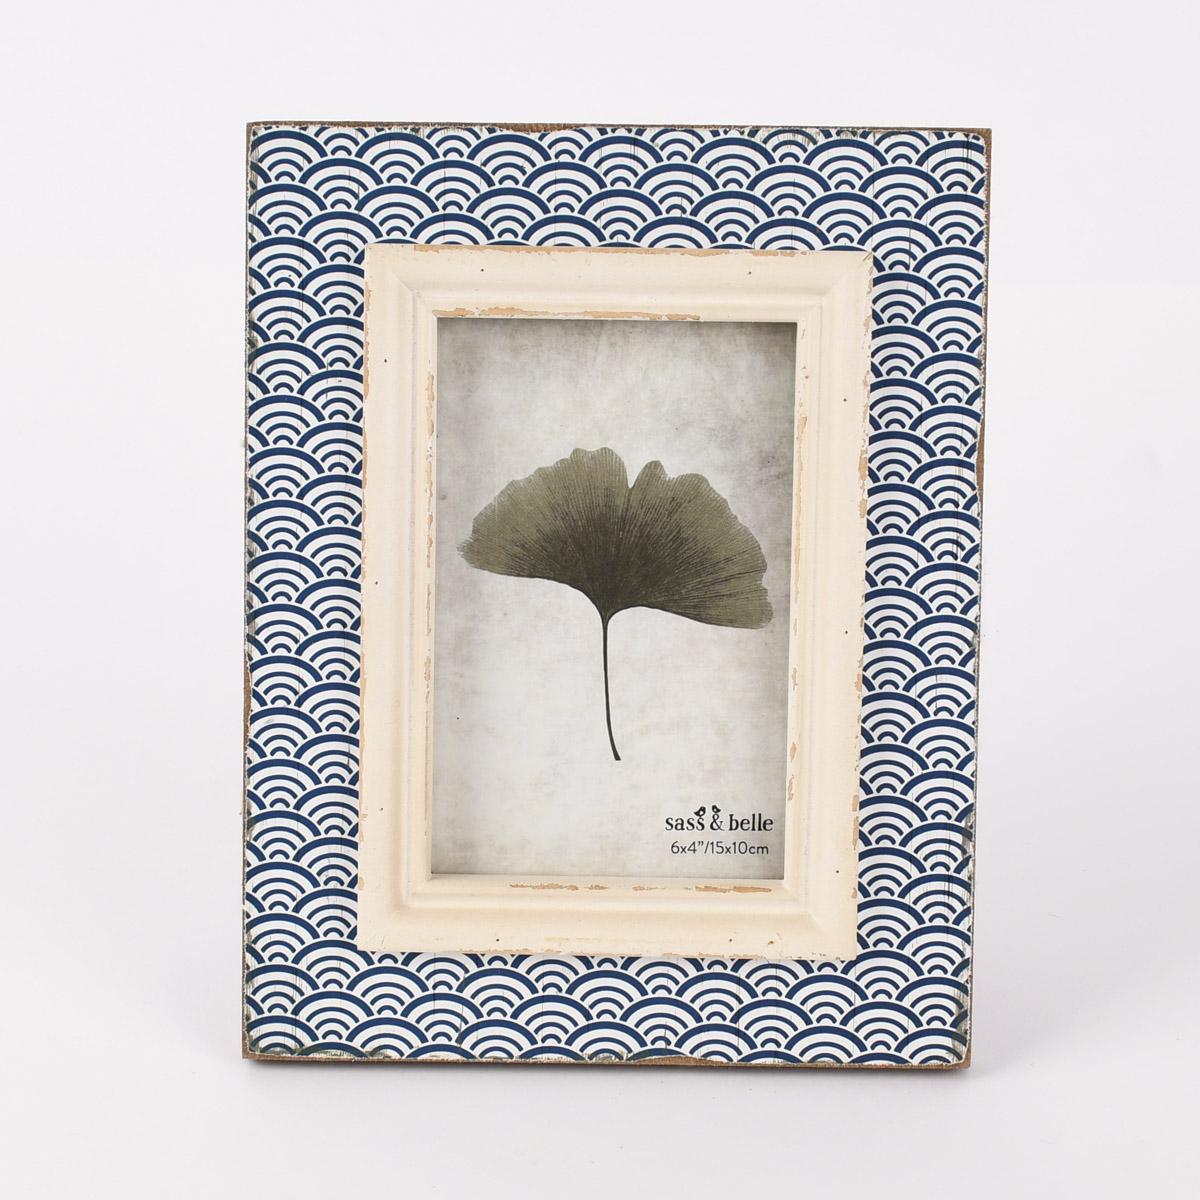 Sass & Belle Bilderrahmen Wellenmuster Shabby-Optik Holz weiß braun blau 18,5x23,5cm